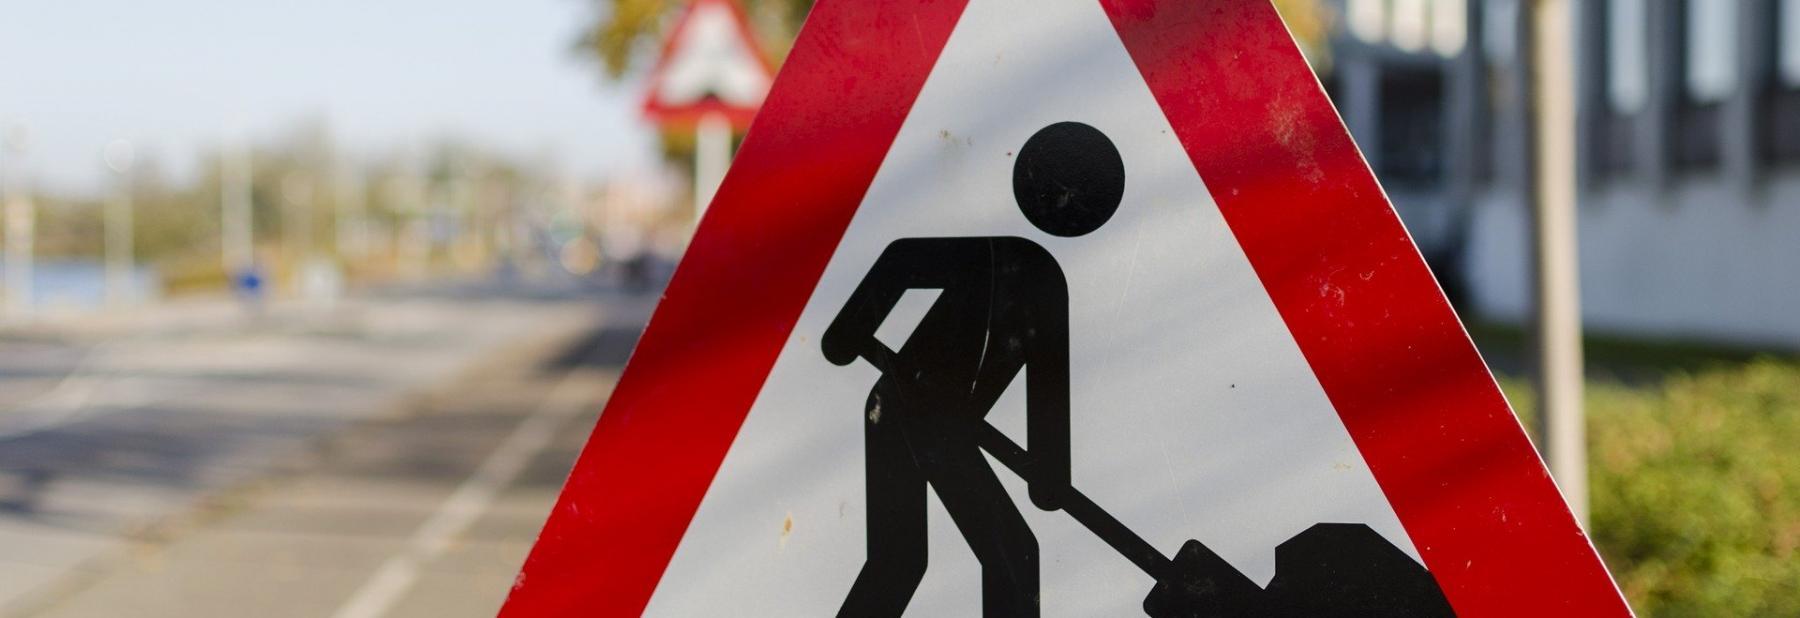 road-work-1148205_1920